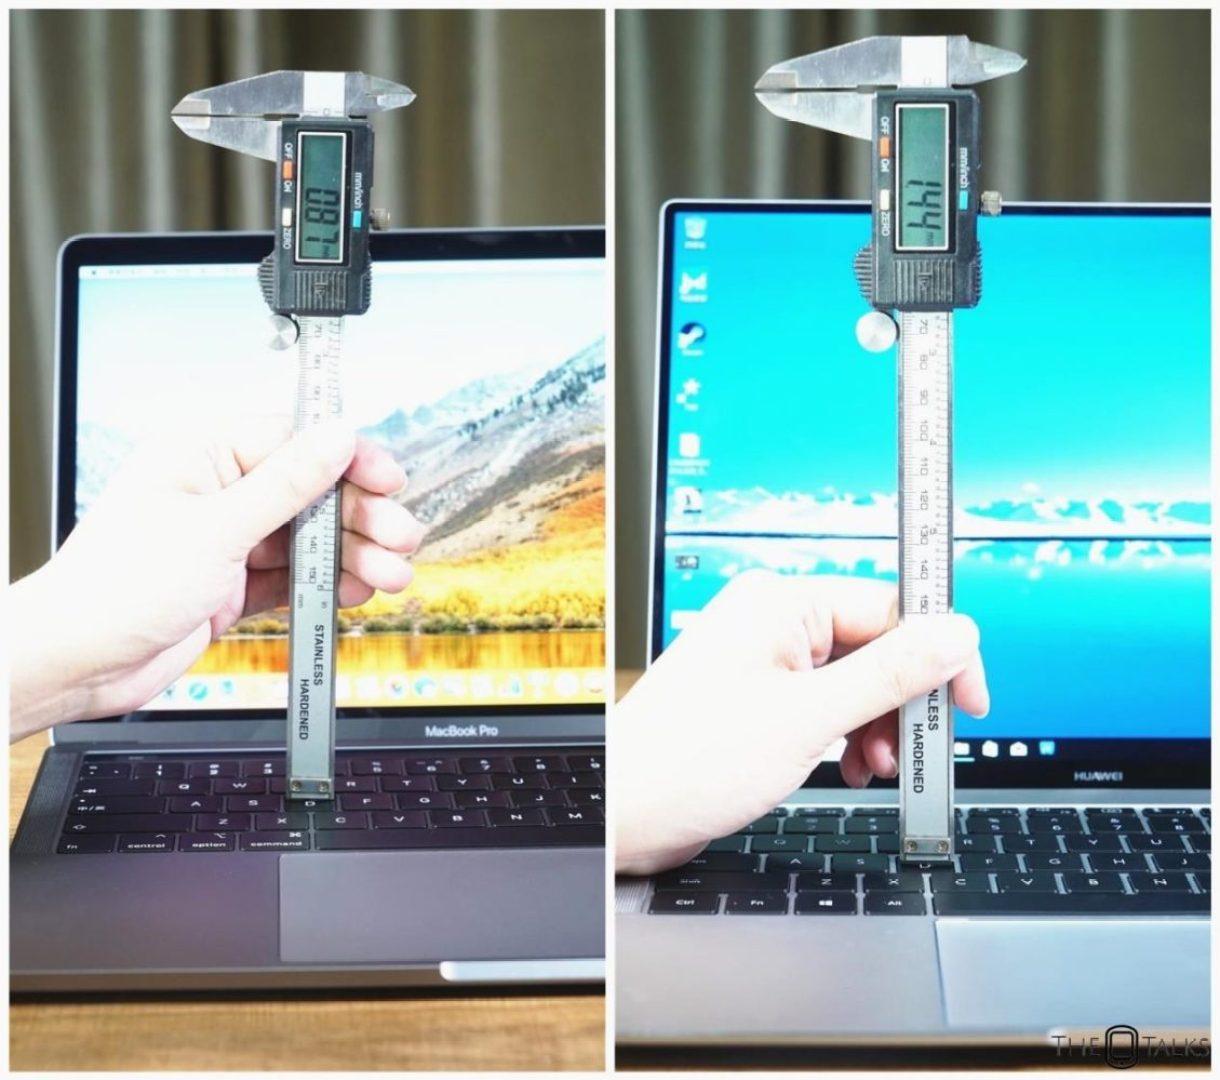 Huawei MateBook X Pro Vs Apple MacBook Pro 2018 Comparison Review - Keystroke Comaprison